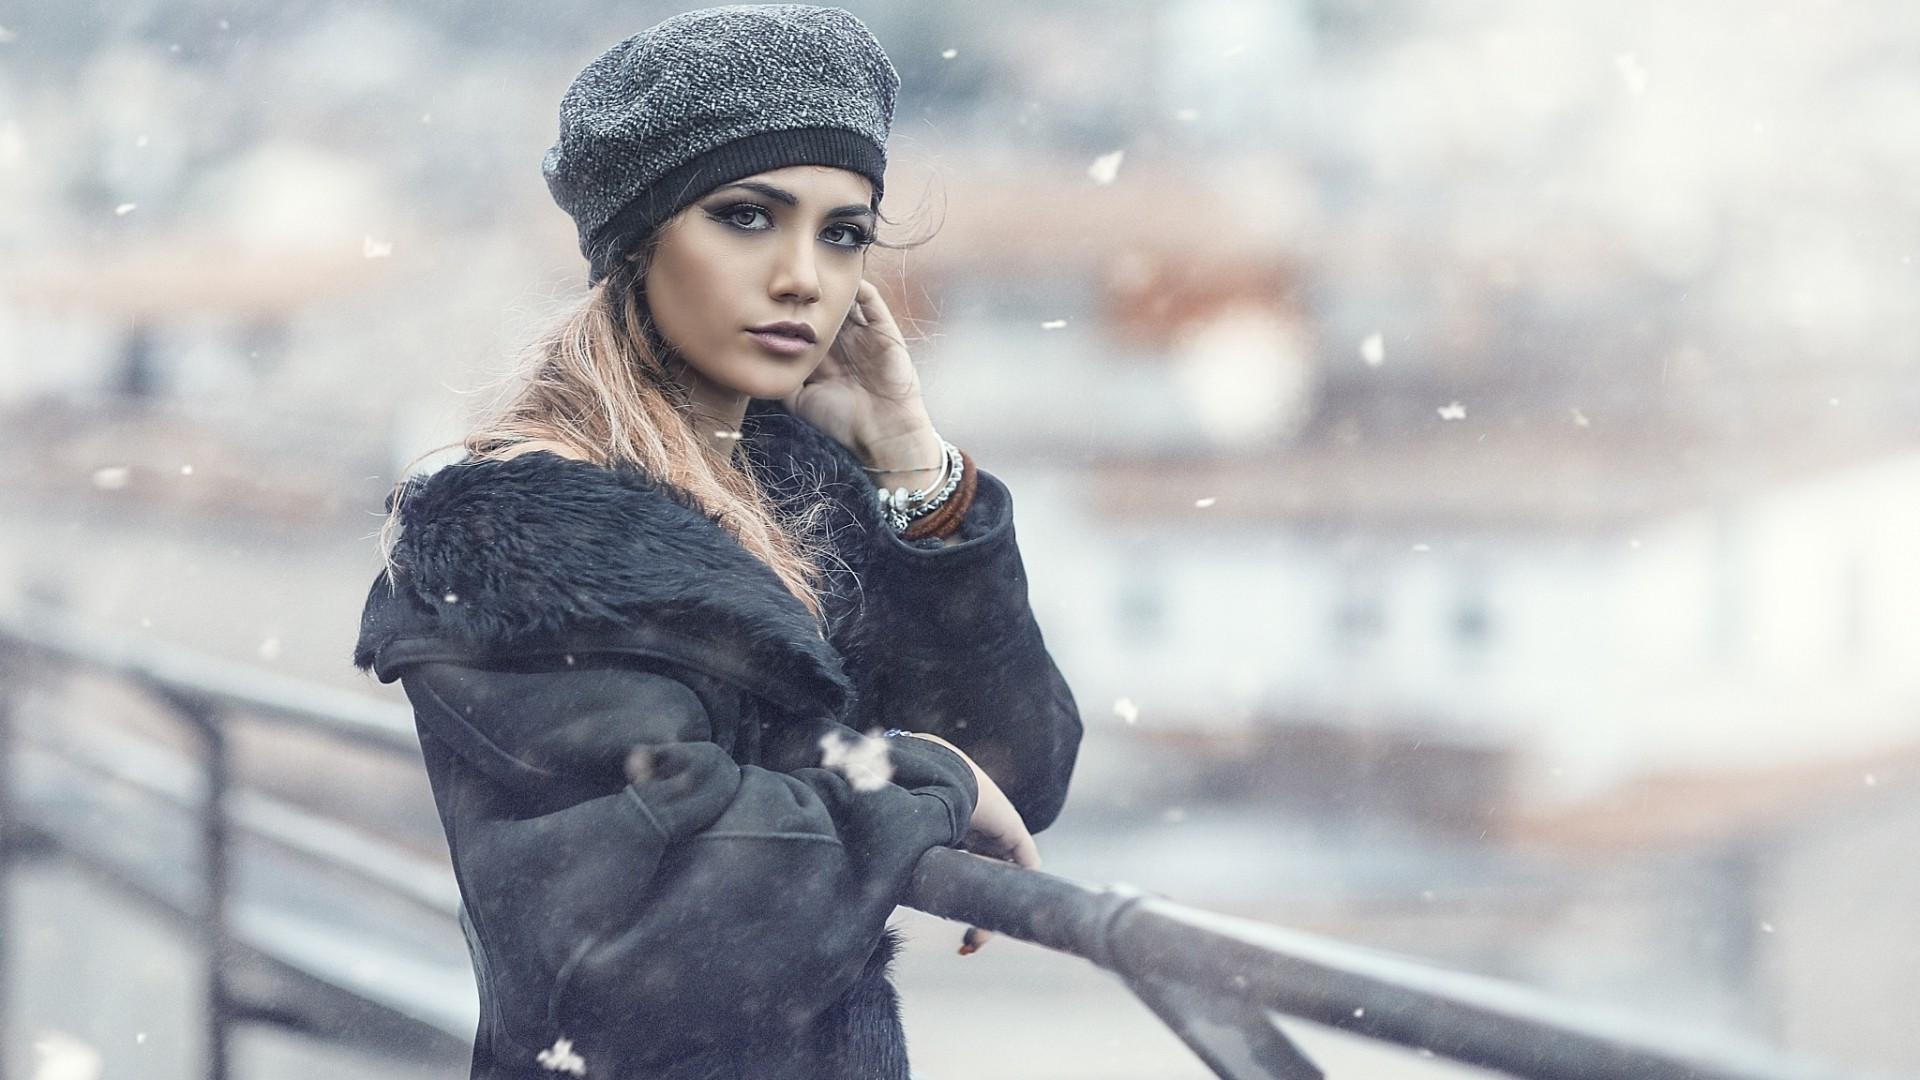 aire libre mujer al pantalla Fondos Mujeres modelo retrato de 4RICqX